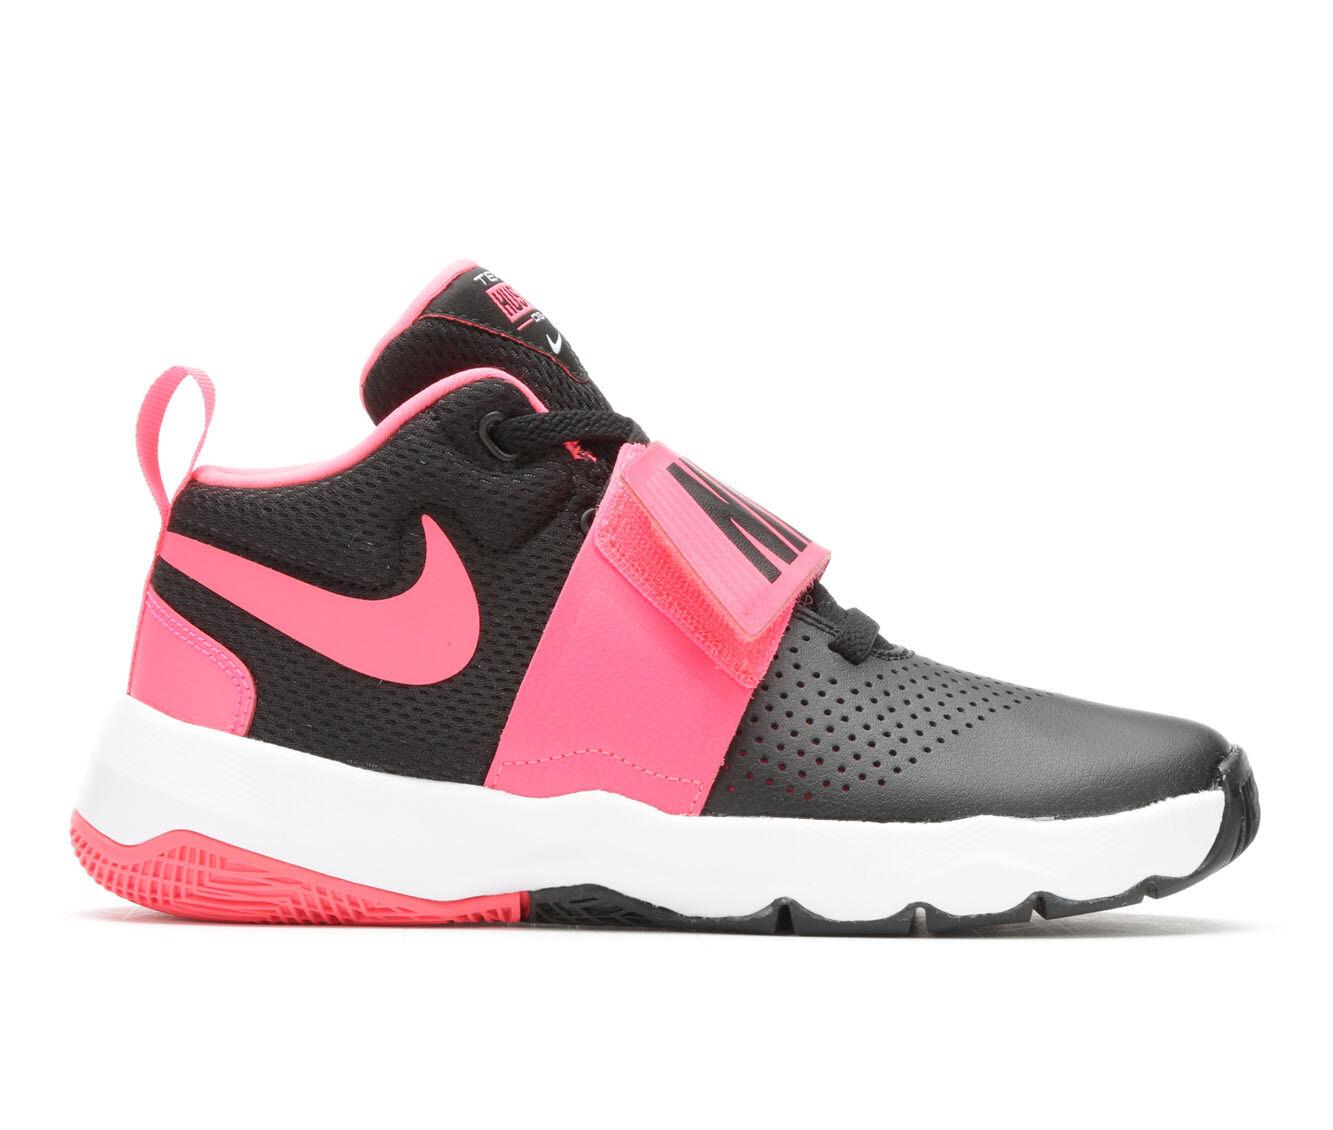 Girlsu0027 Nike Team Hustle D8 Girls 3.5-7 Basketball Shoes